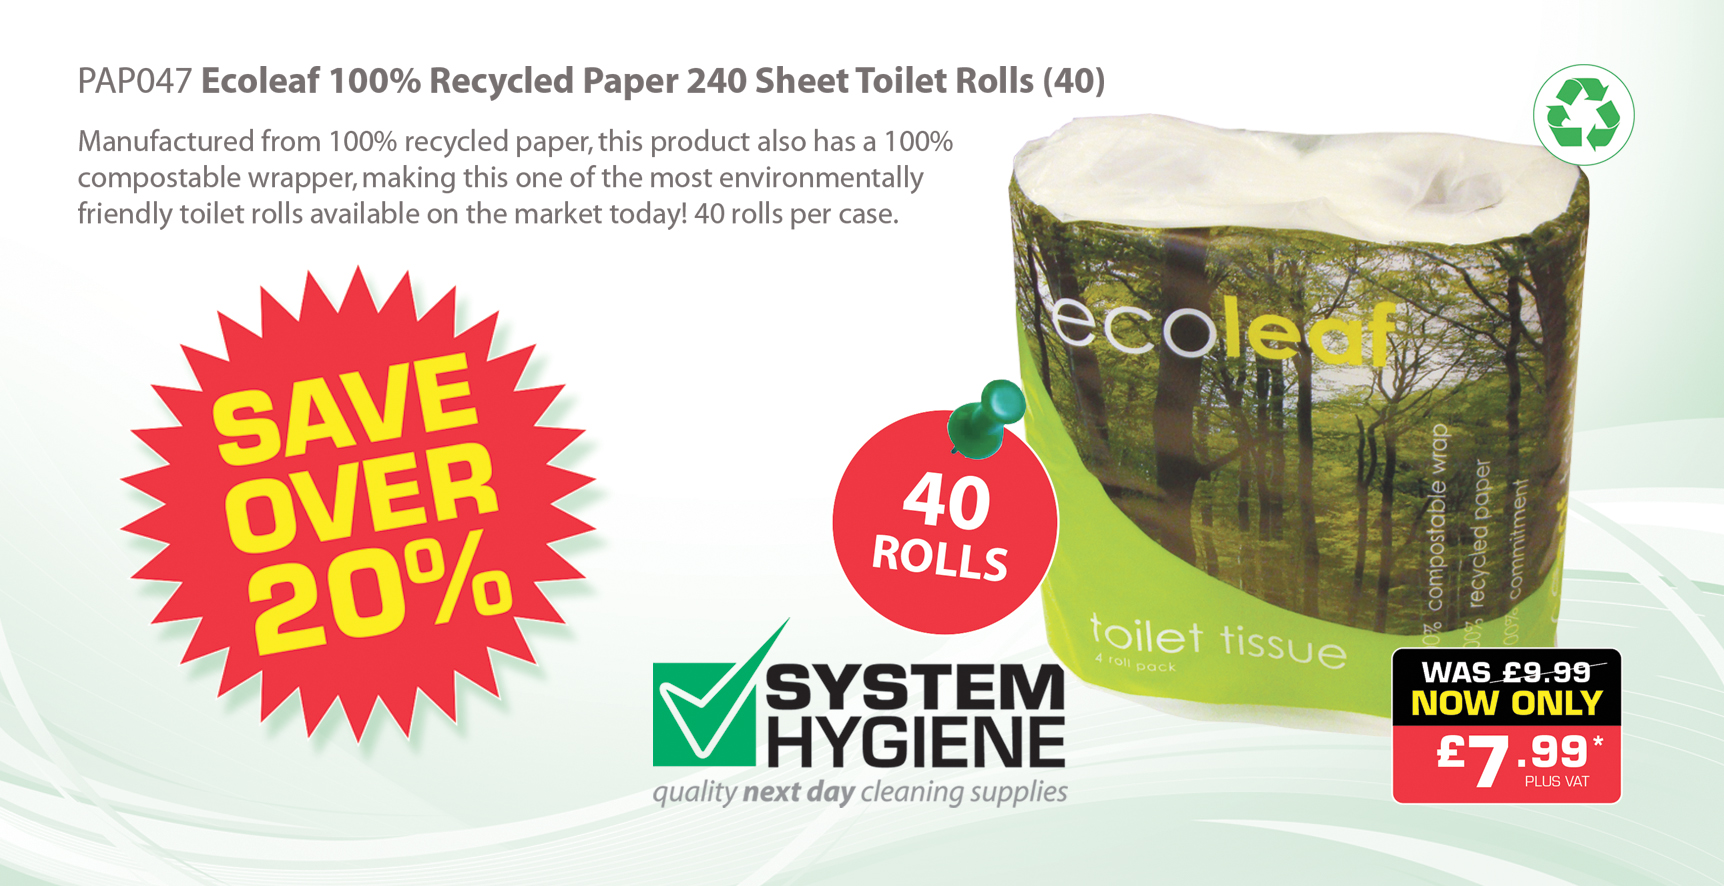 Ecoleaf Advert